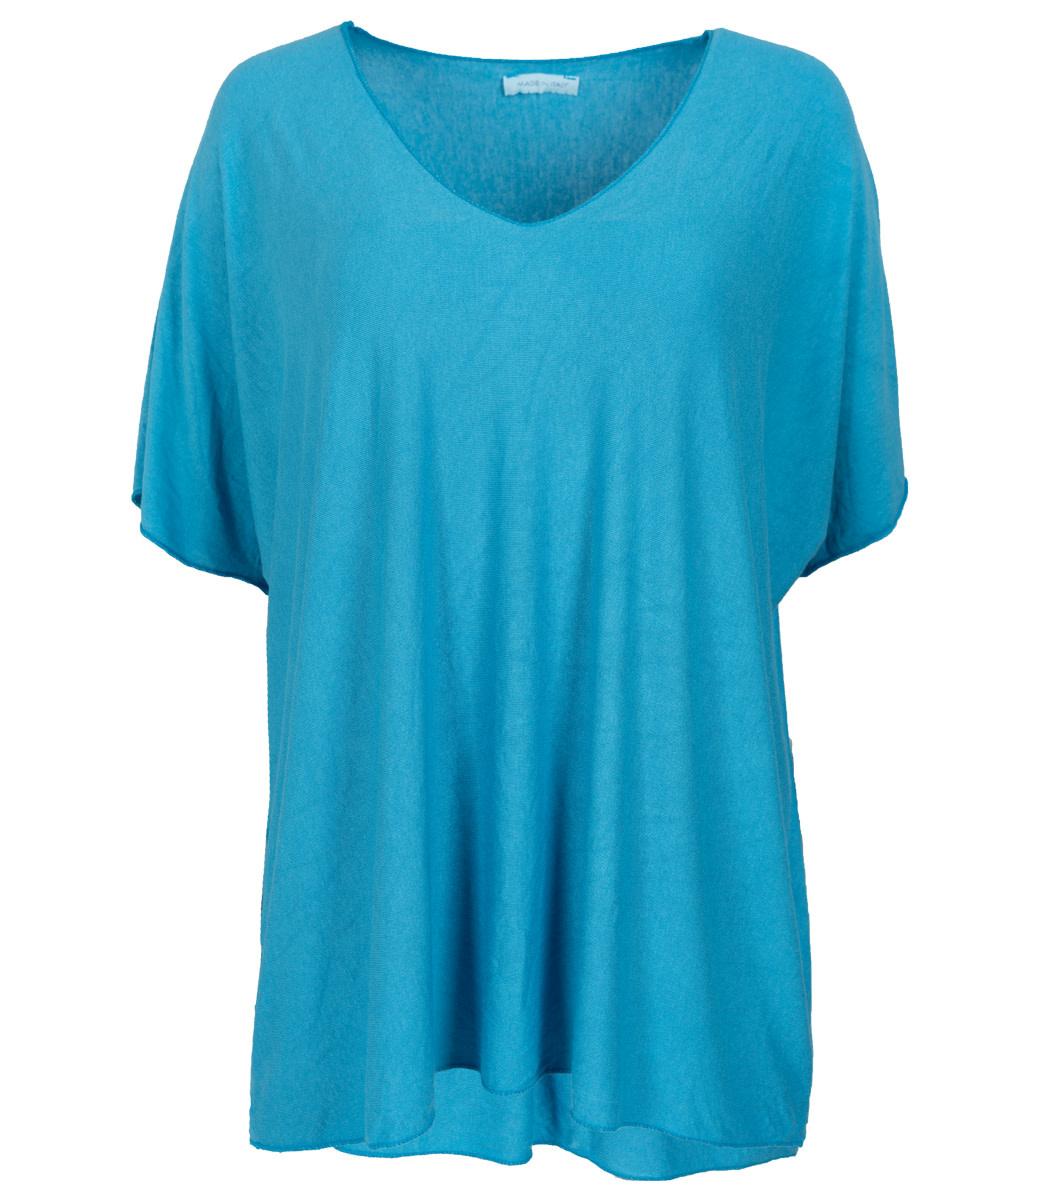 Wannahavesfashion Shirt ijsblauw v hals Lilly